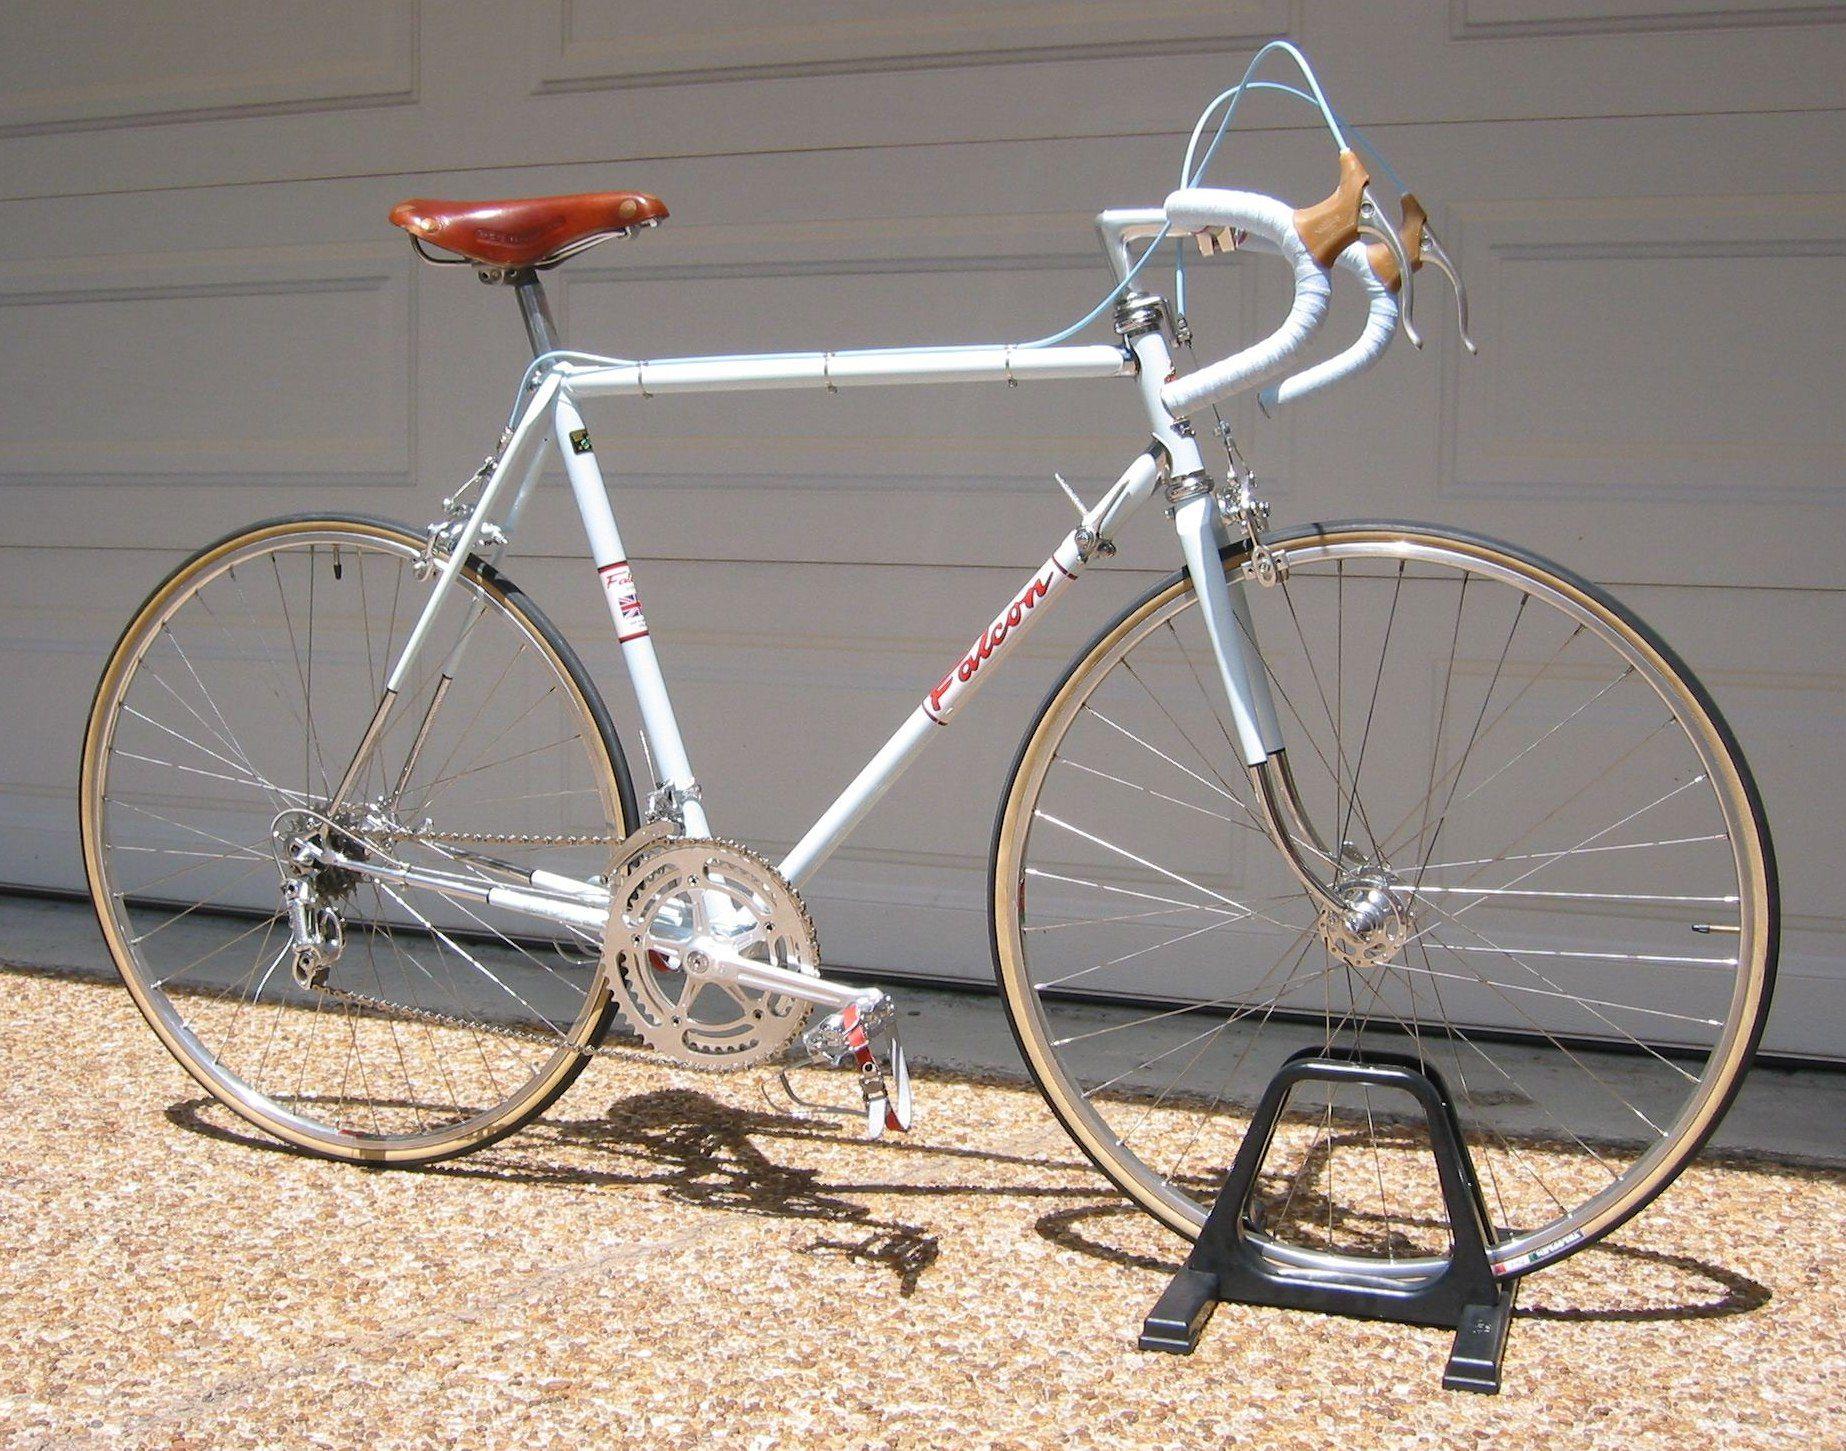 Very pity falcon san remo vintage bicycle you